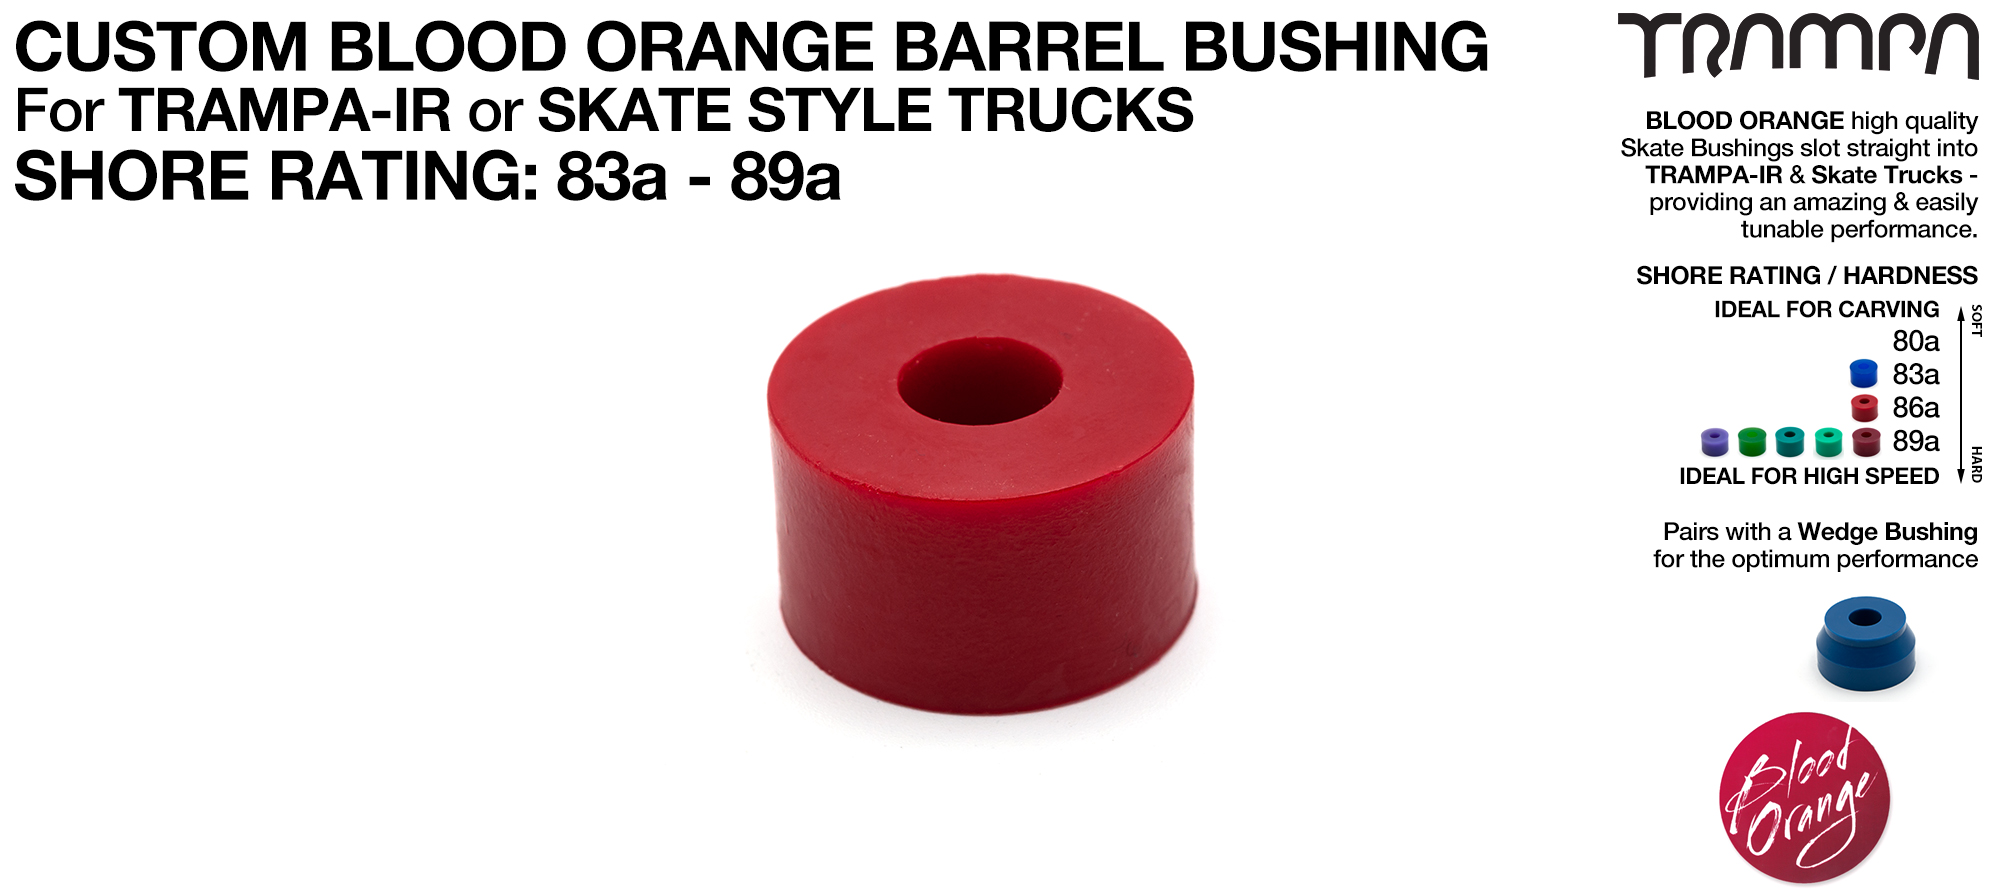 Custom Blood Orange Bushings